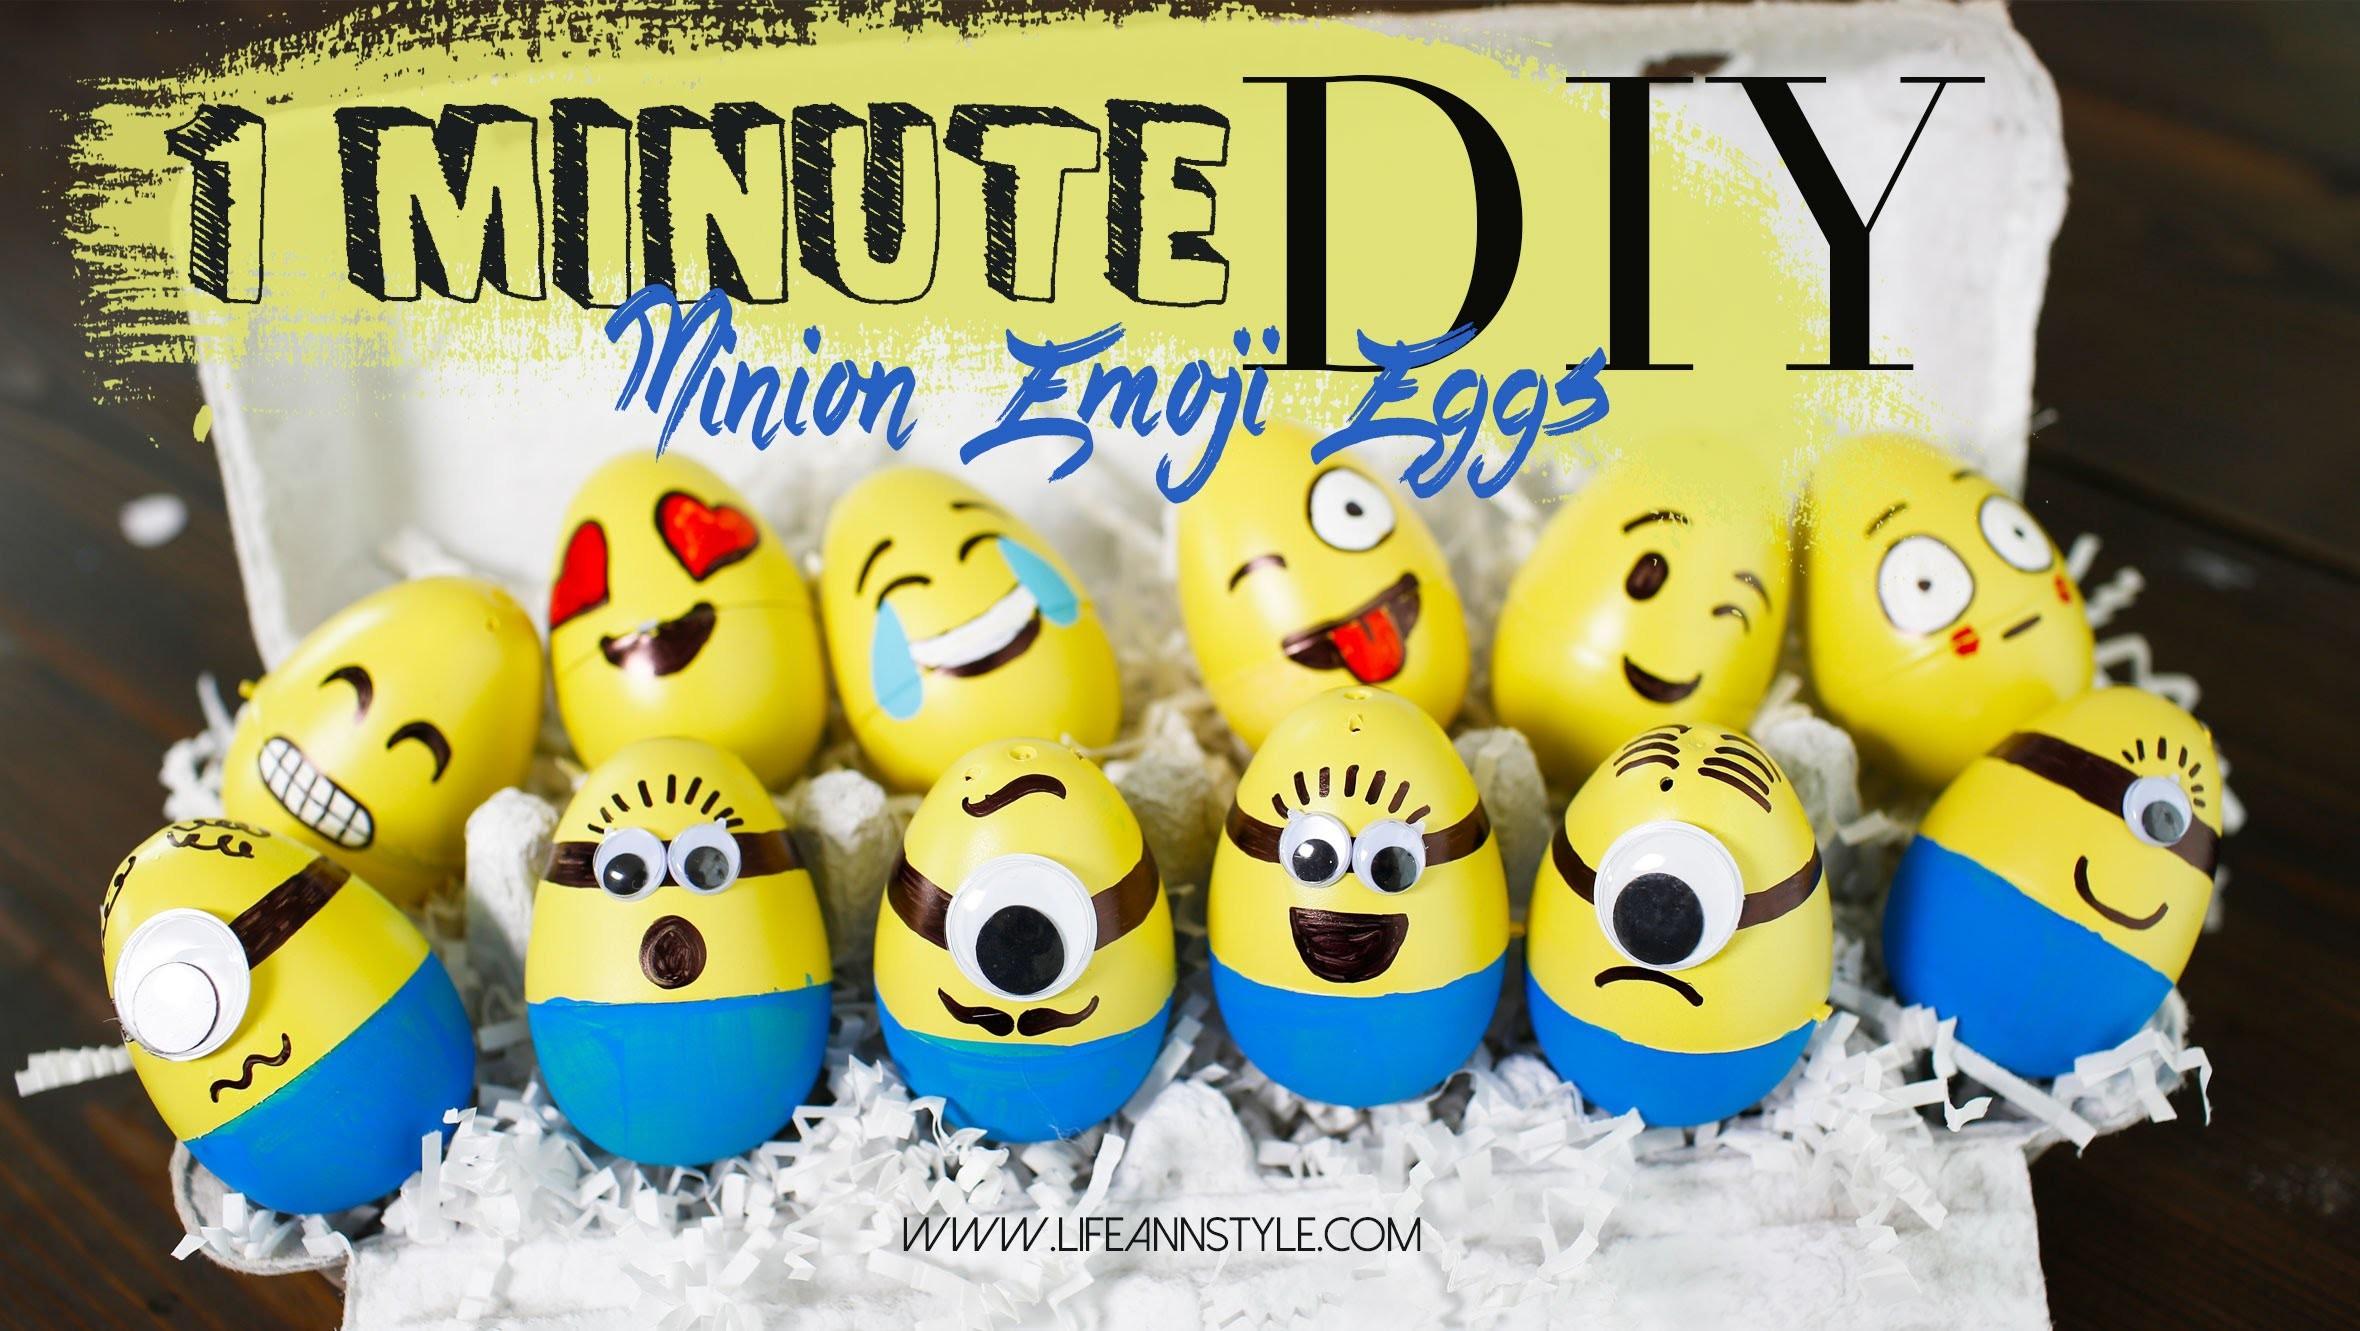 DIY Minion Emoji Decorated Eggs | 1 Minute DIY  | ANNEORSHINE